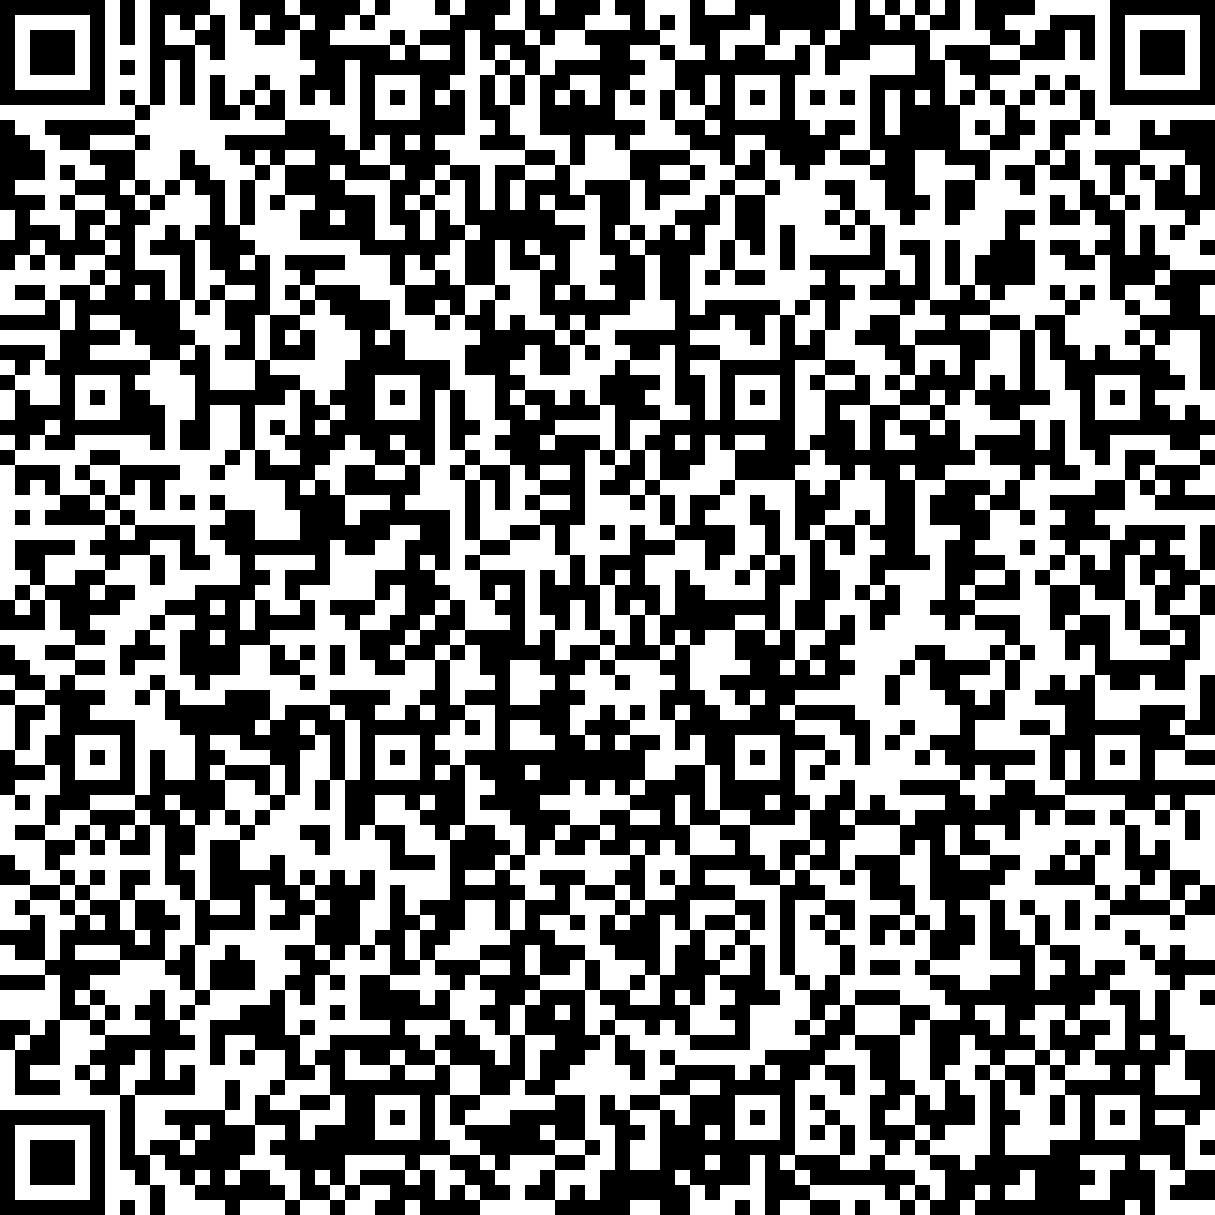 Mobilefish code large image